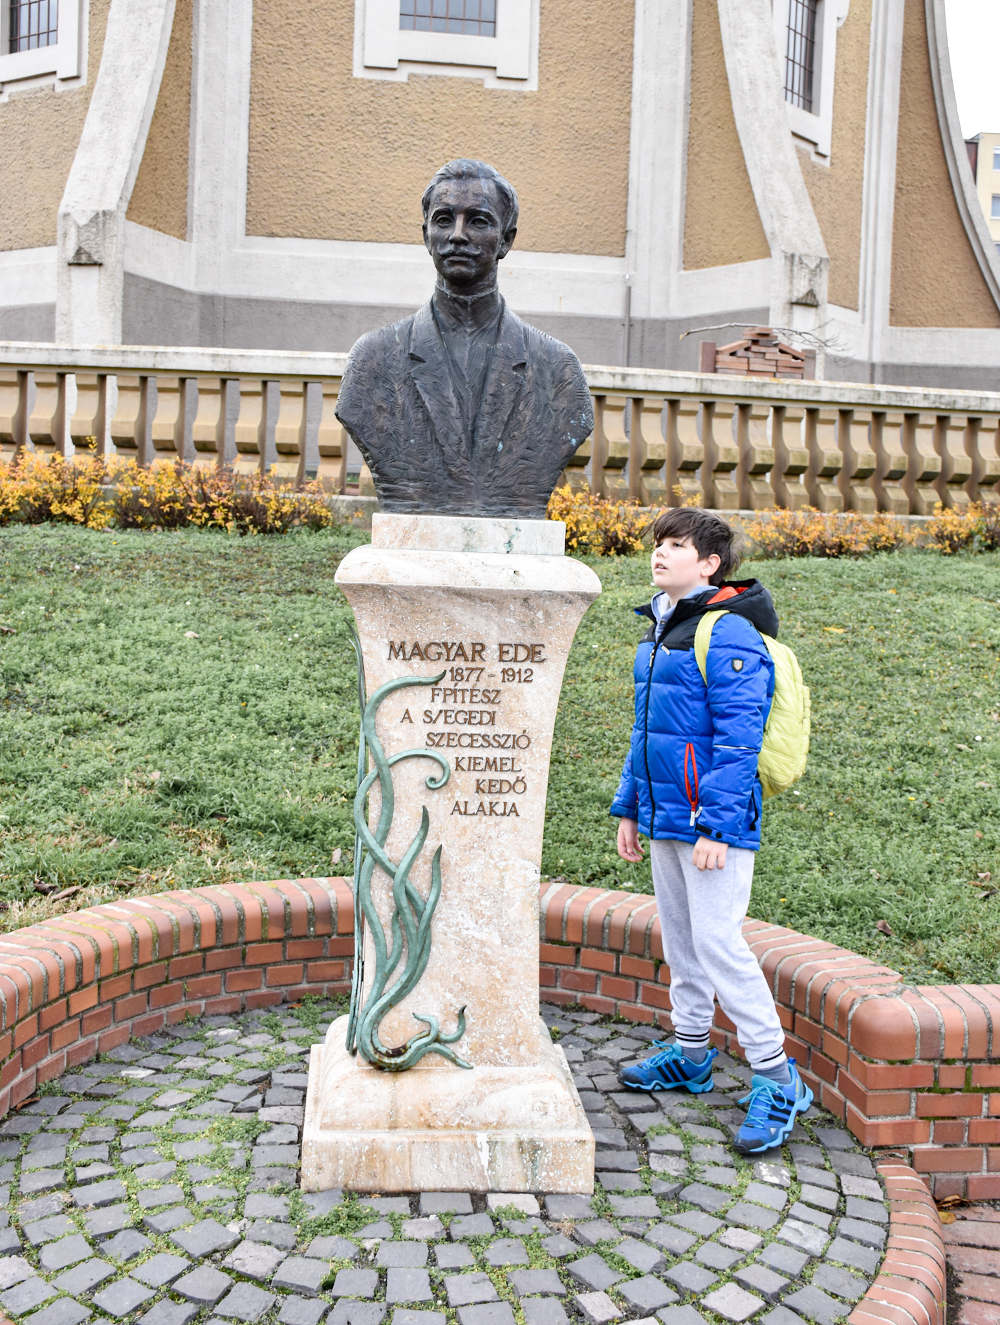 Bista Ede Madjar ispred vodotornja u Segedinu